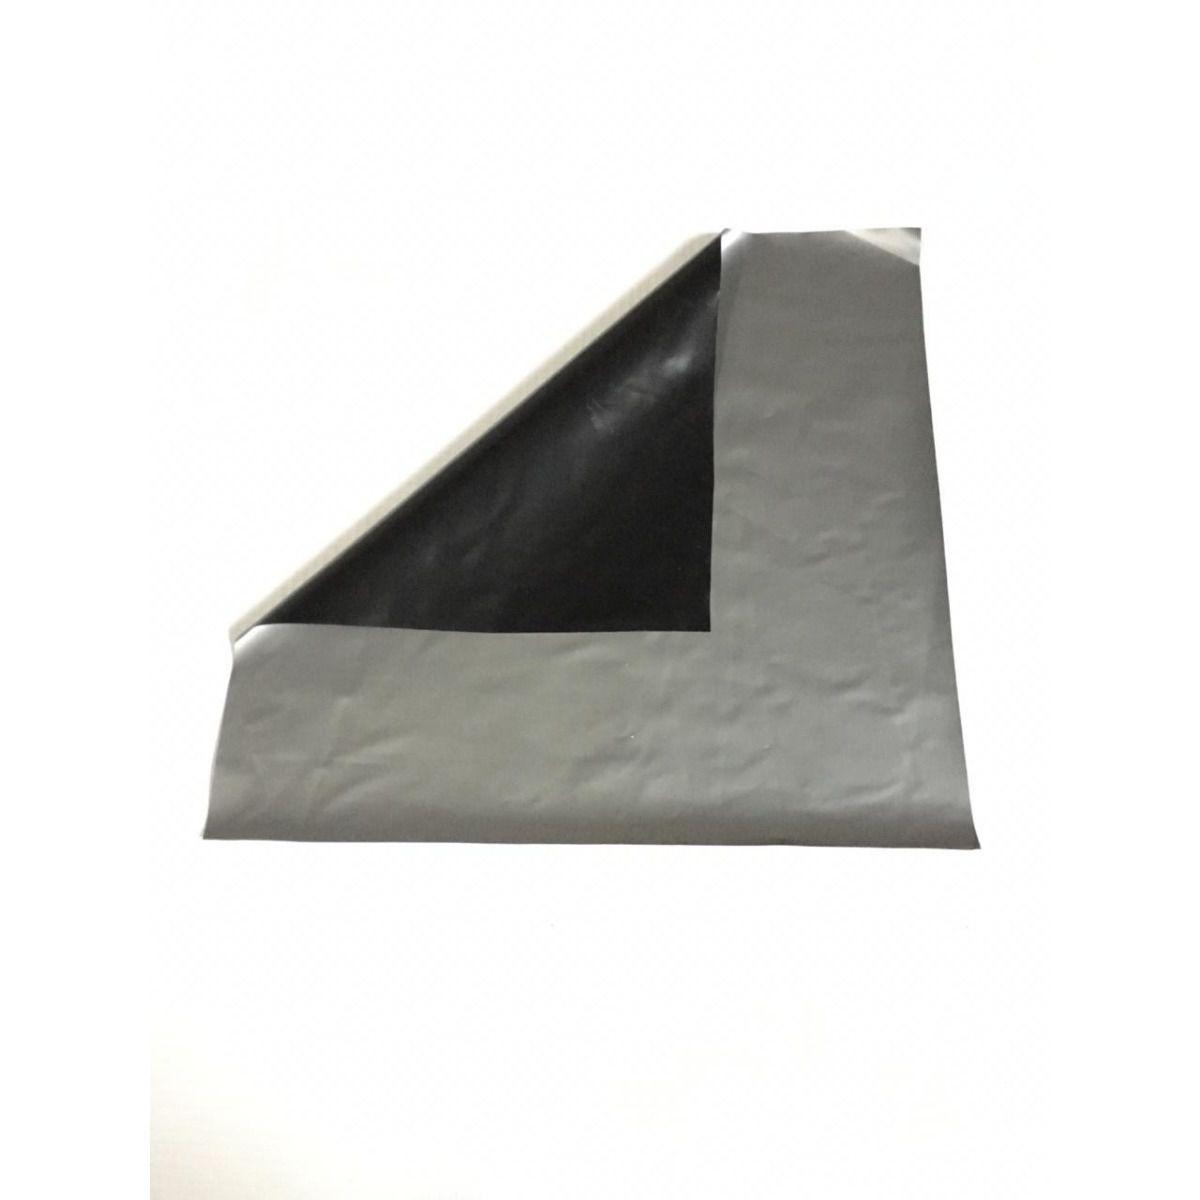 Lona Para Silagem Dupla Face Prata/Preta 25x12 Aprox 150 Mic